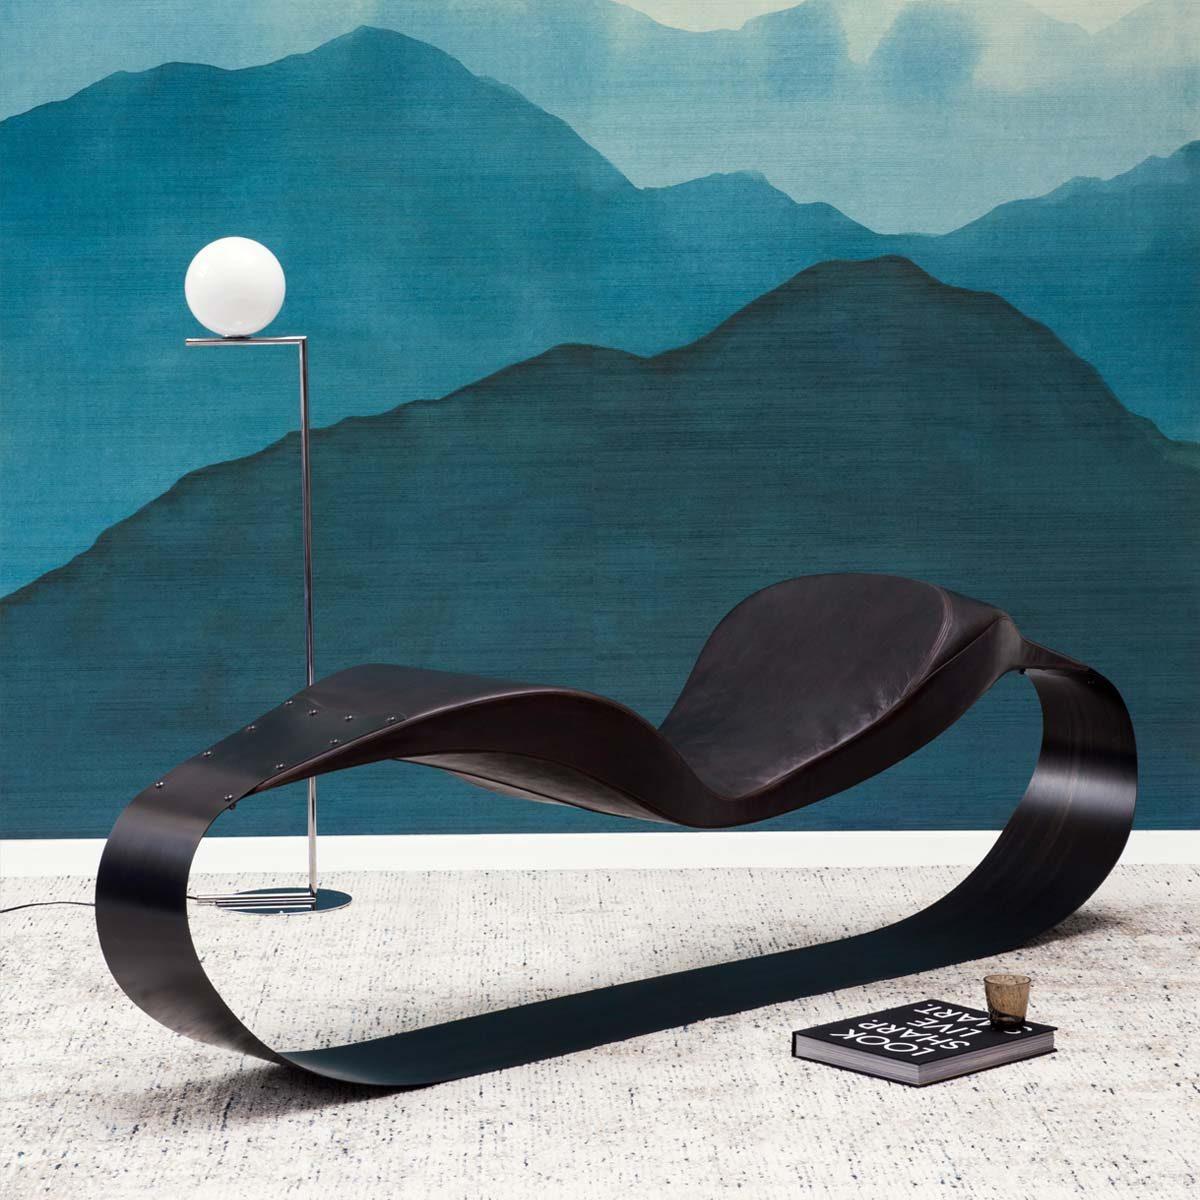 Stupendous Ron Arad Restless Design Maverik Affluency Bralicious Painted Fabric Chair Ideas Braliciousco